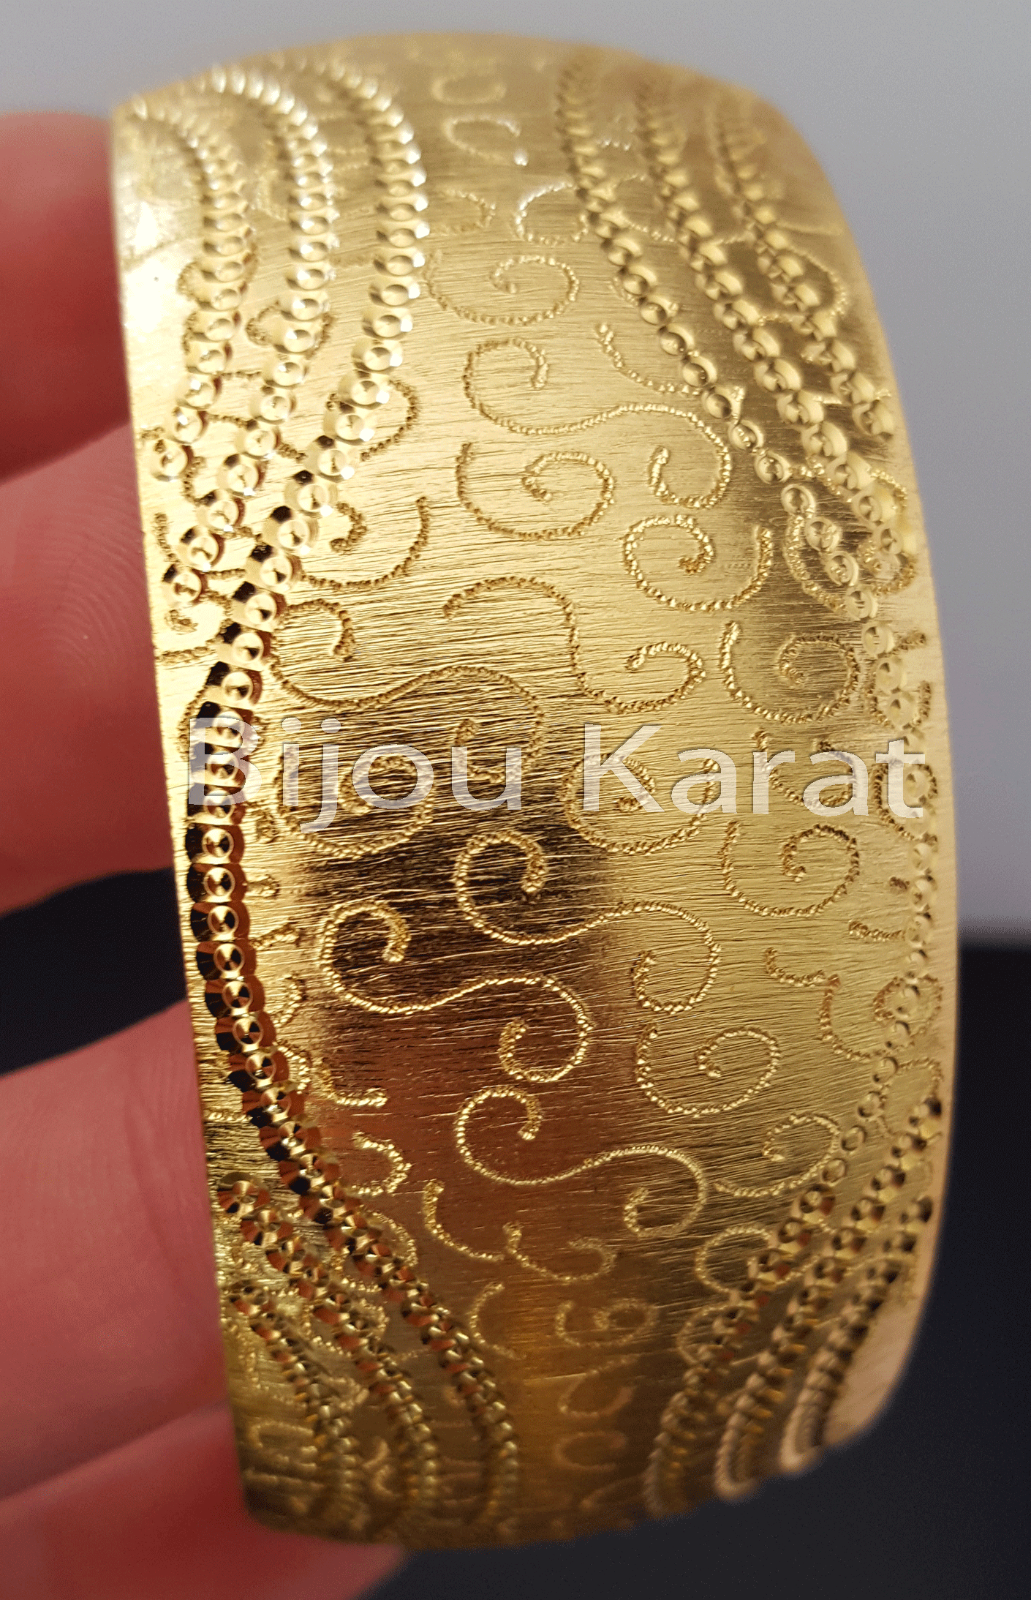 Trabzon Bilezik Bombey Türkische Gold Armreif Armreifen 22 Ayar Altin Kaplama